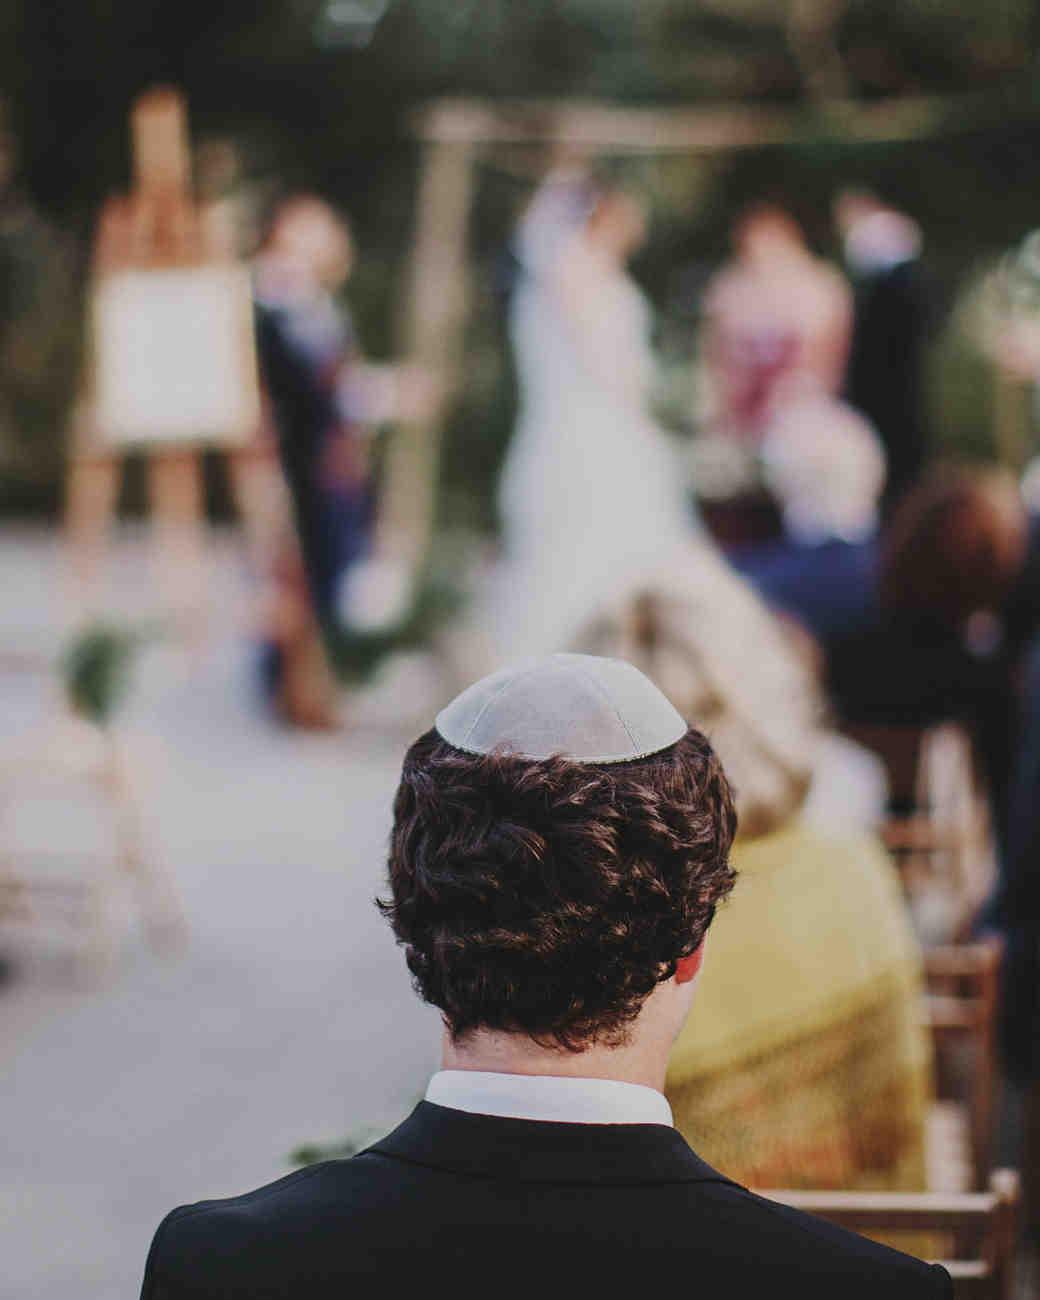 tamara-brett-wedding-ceremony-1045-s112120-0915.jpg